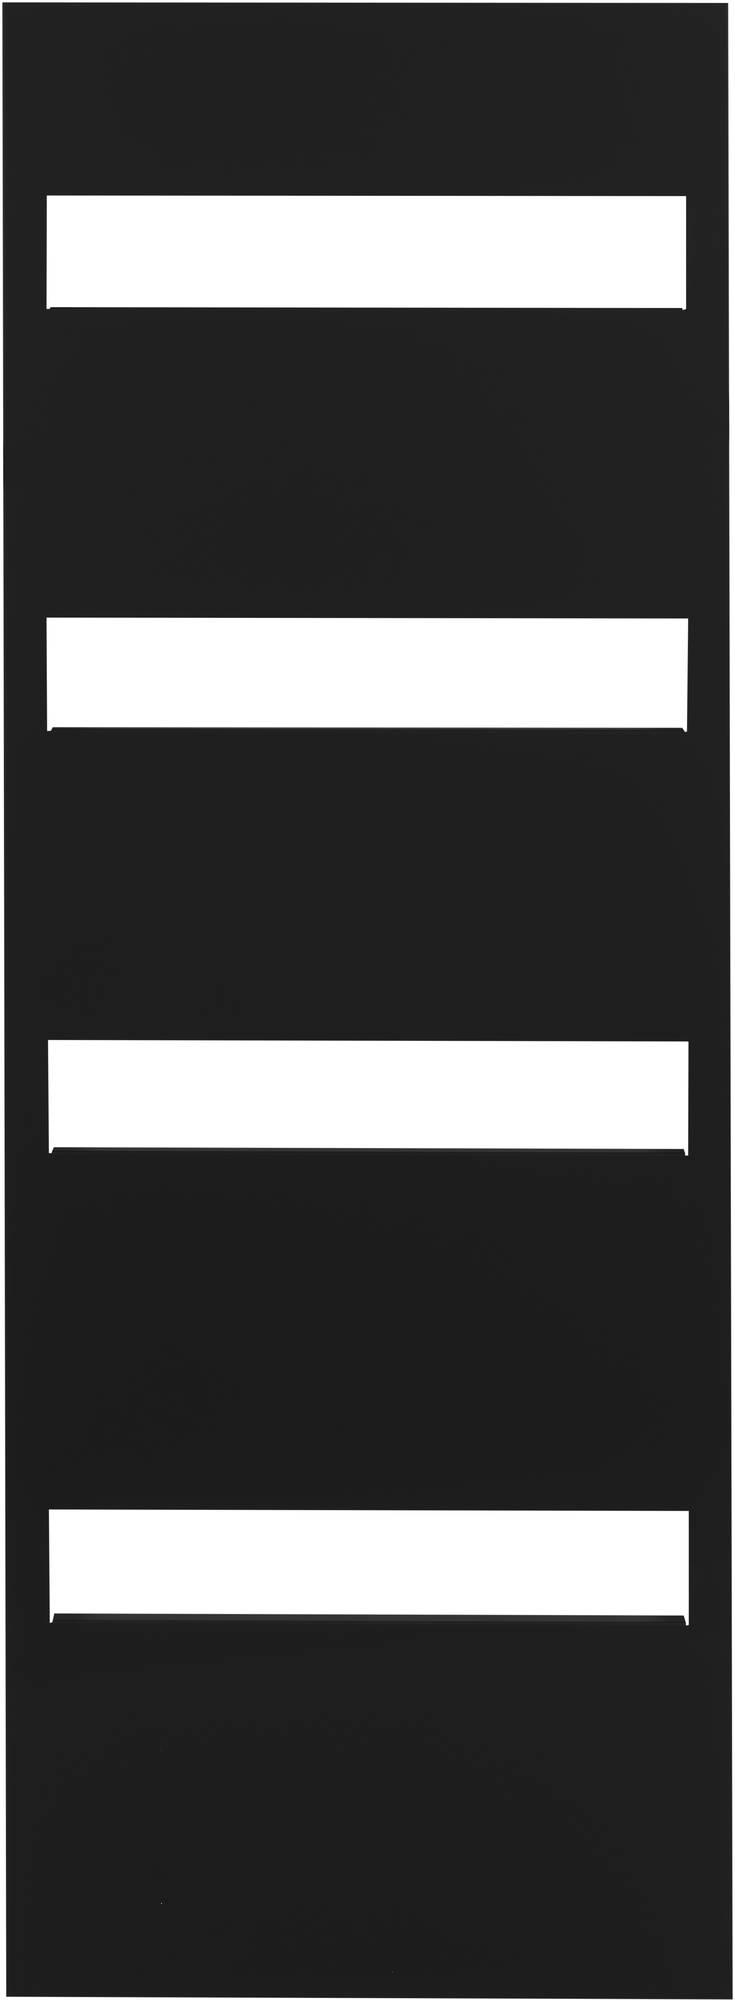 Ben Paros Designradiator 60,5x170,3 cm 725W Zwart